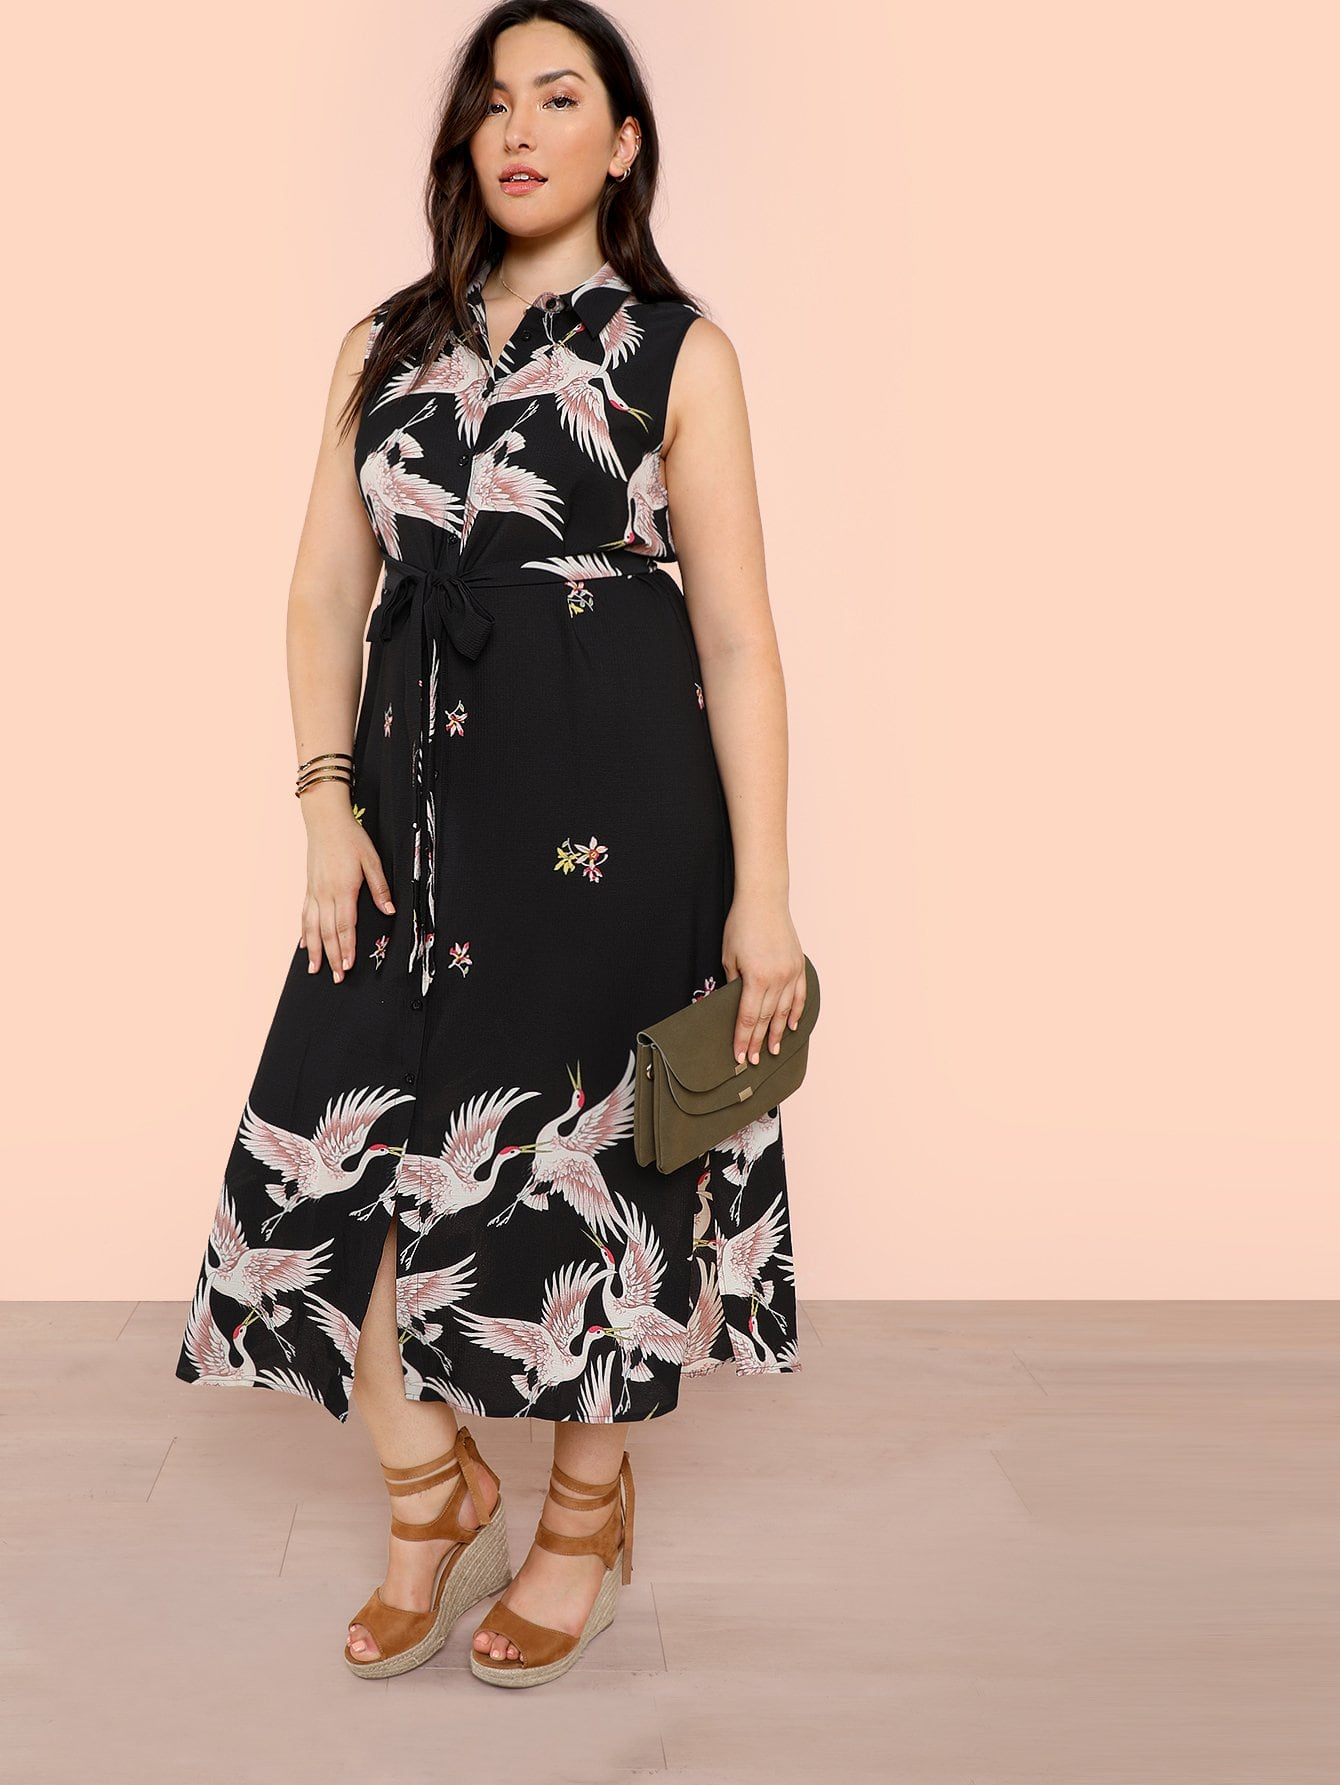 Plus Crane Bird Print Sleeveless Shirt Dress with Belt edith marquez feria juarez